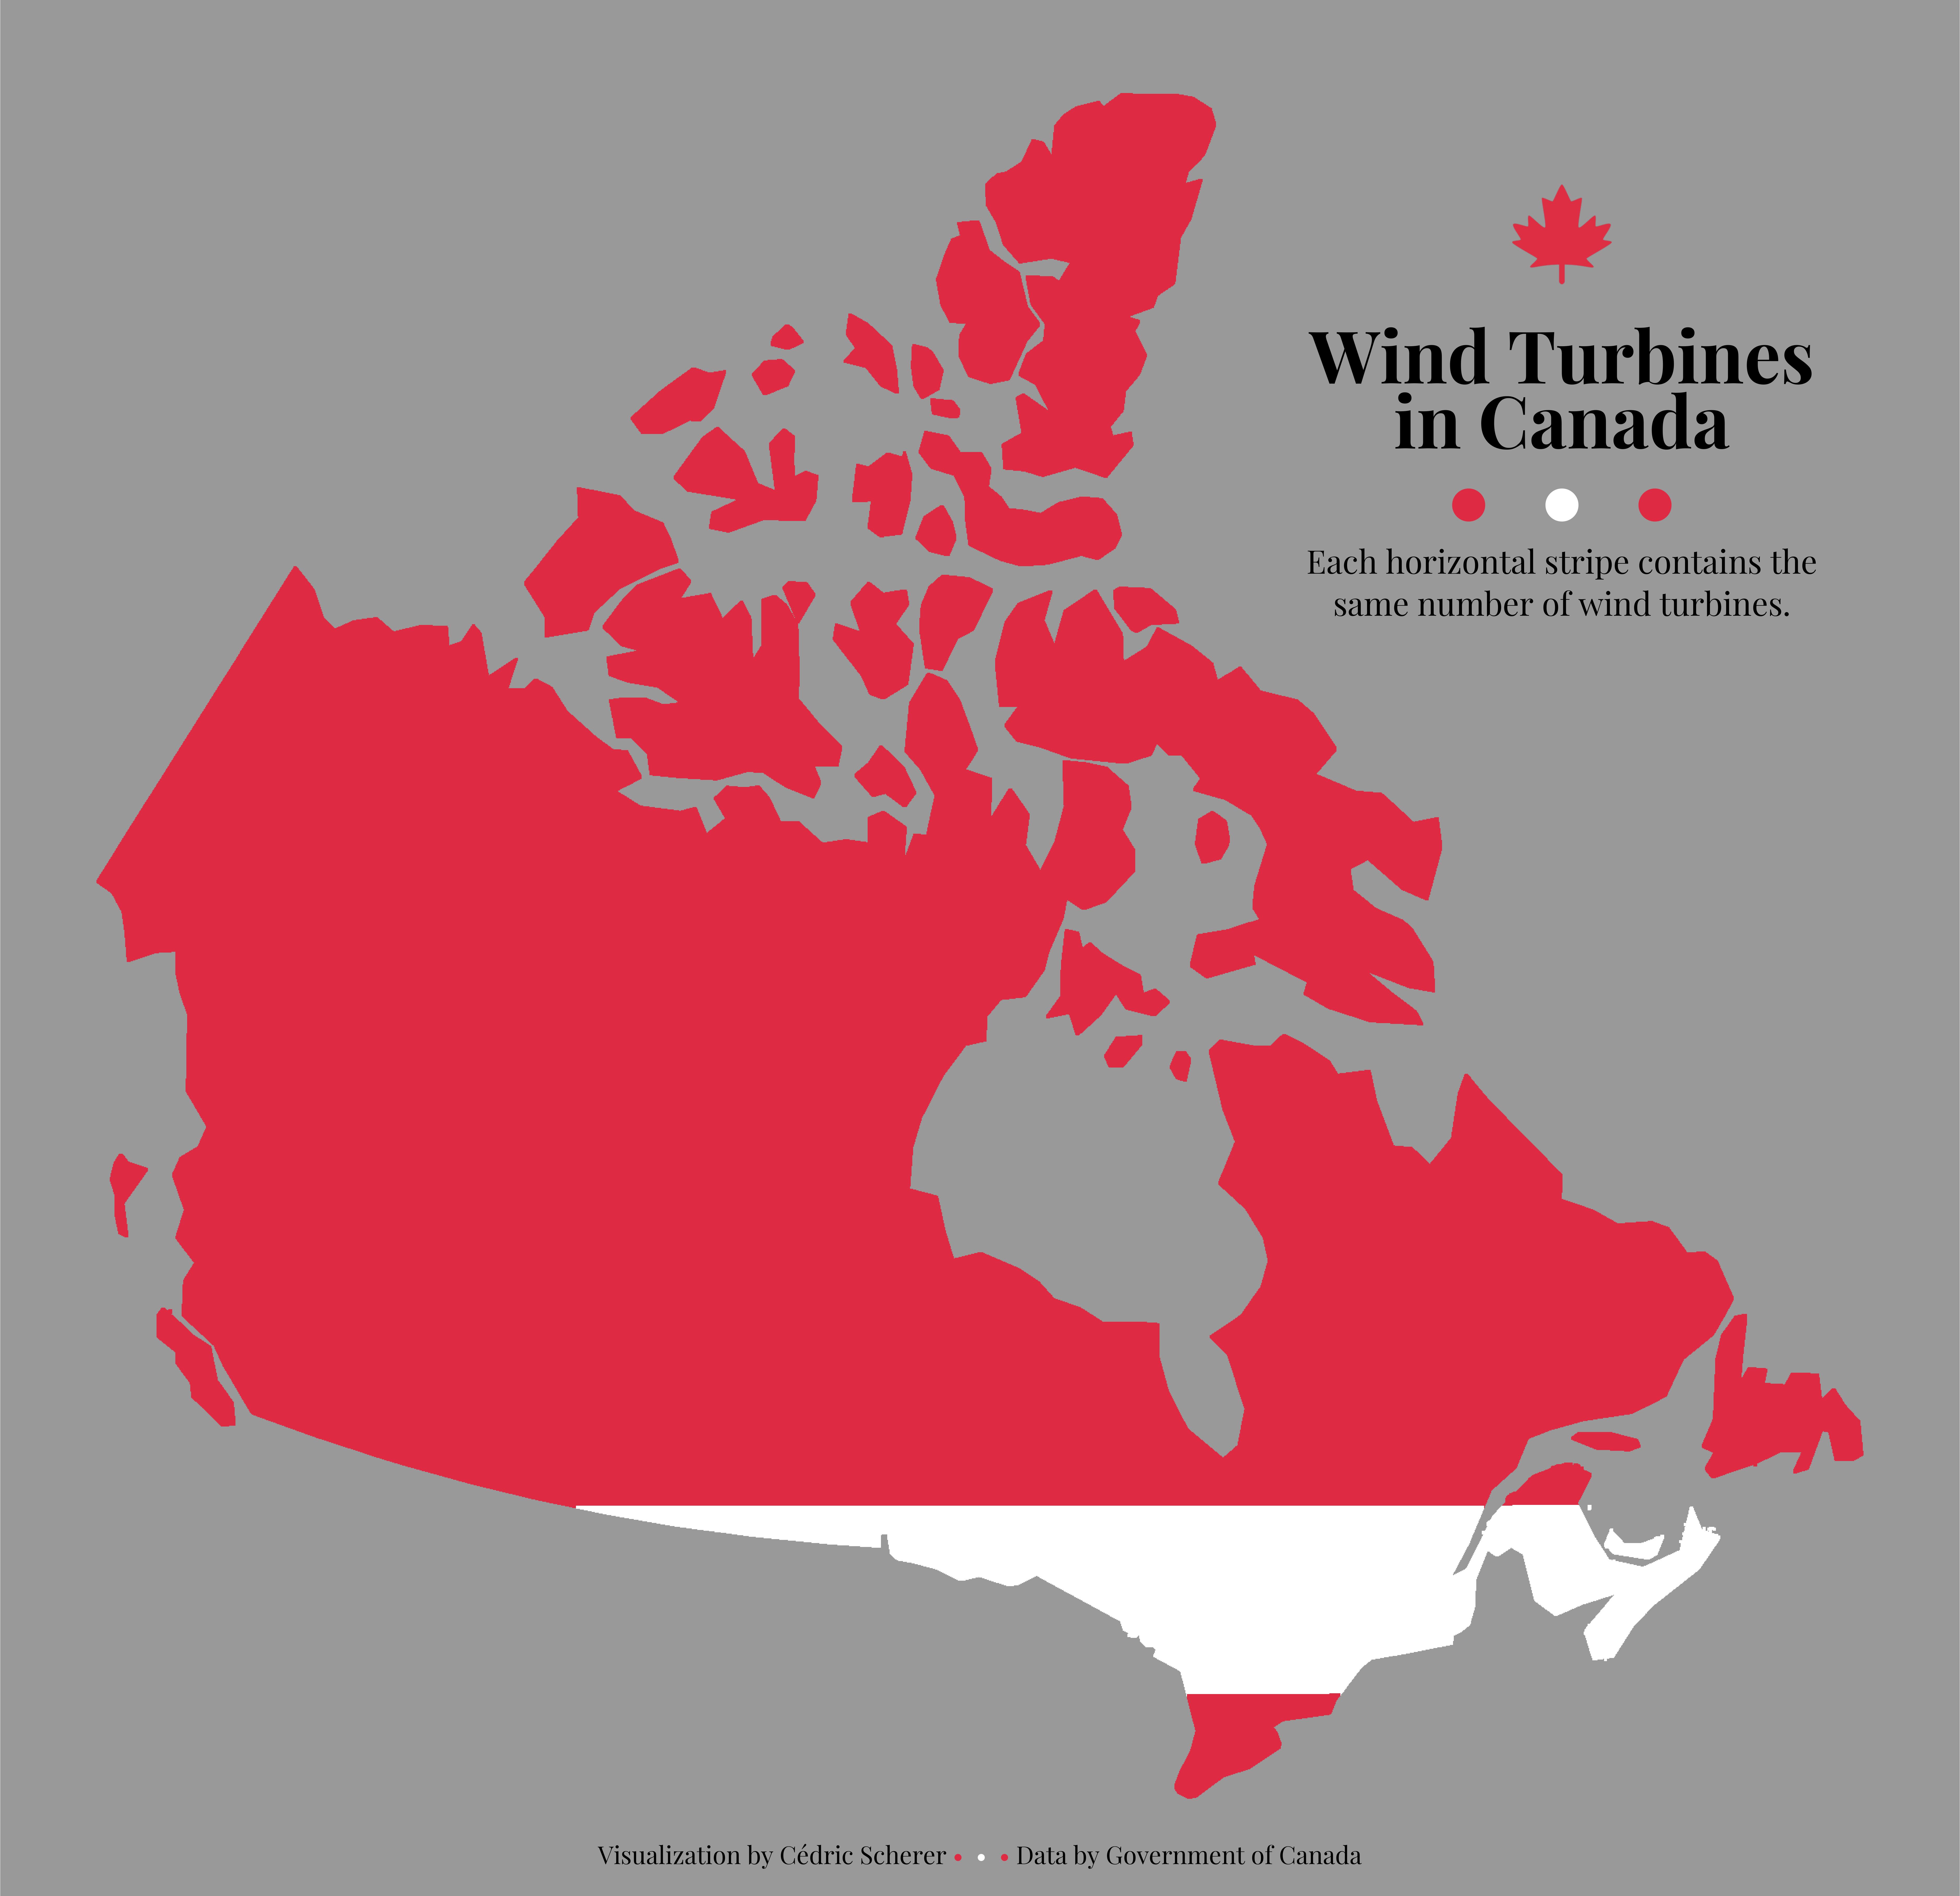 ./plots/2020_44/2020_44_CanadianWindTurbines_h.png